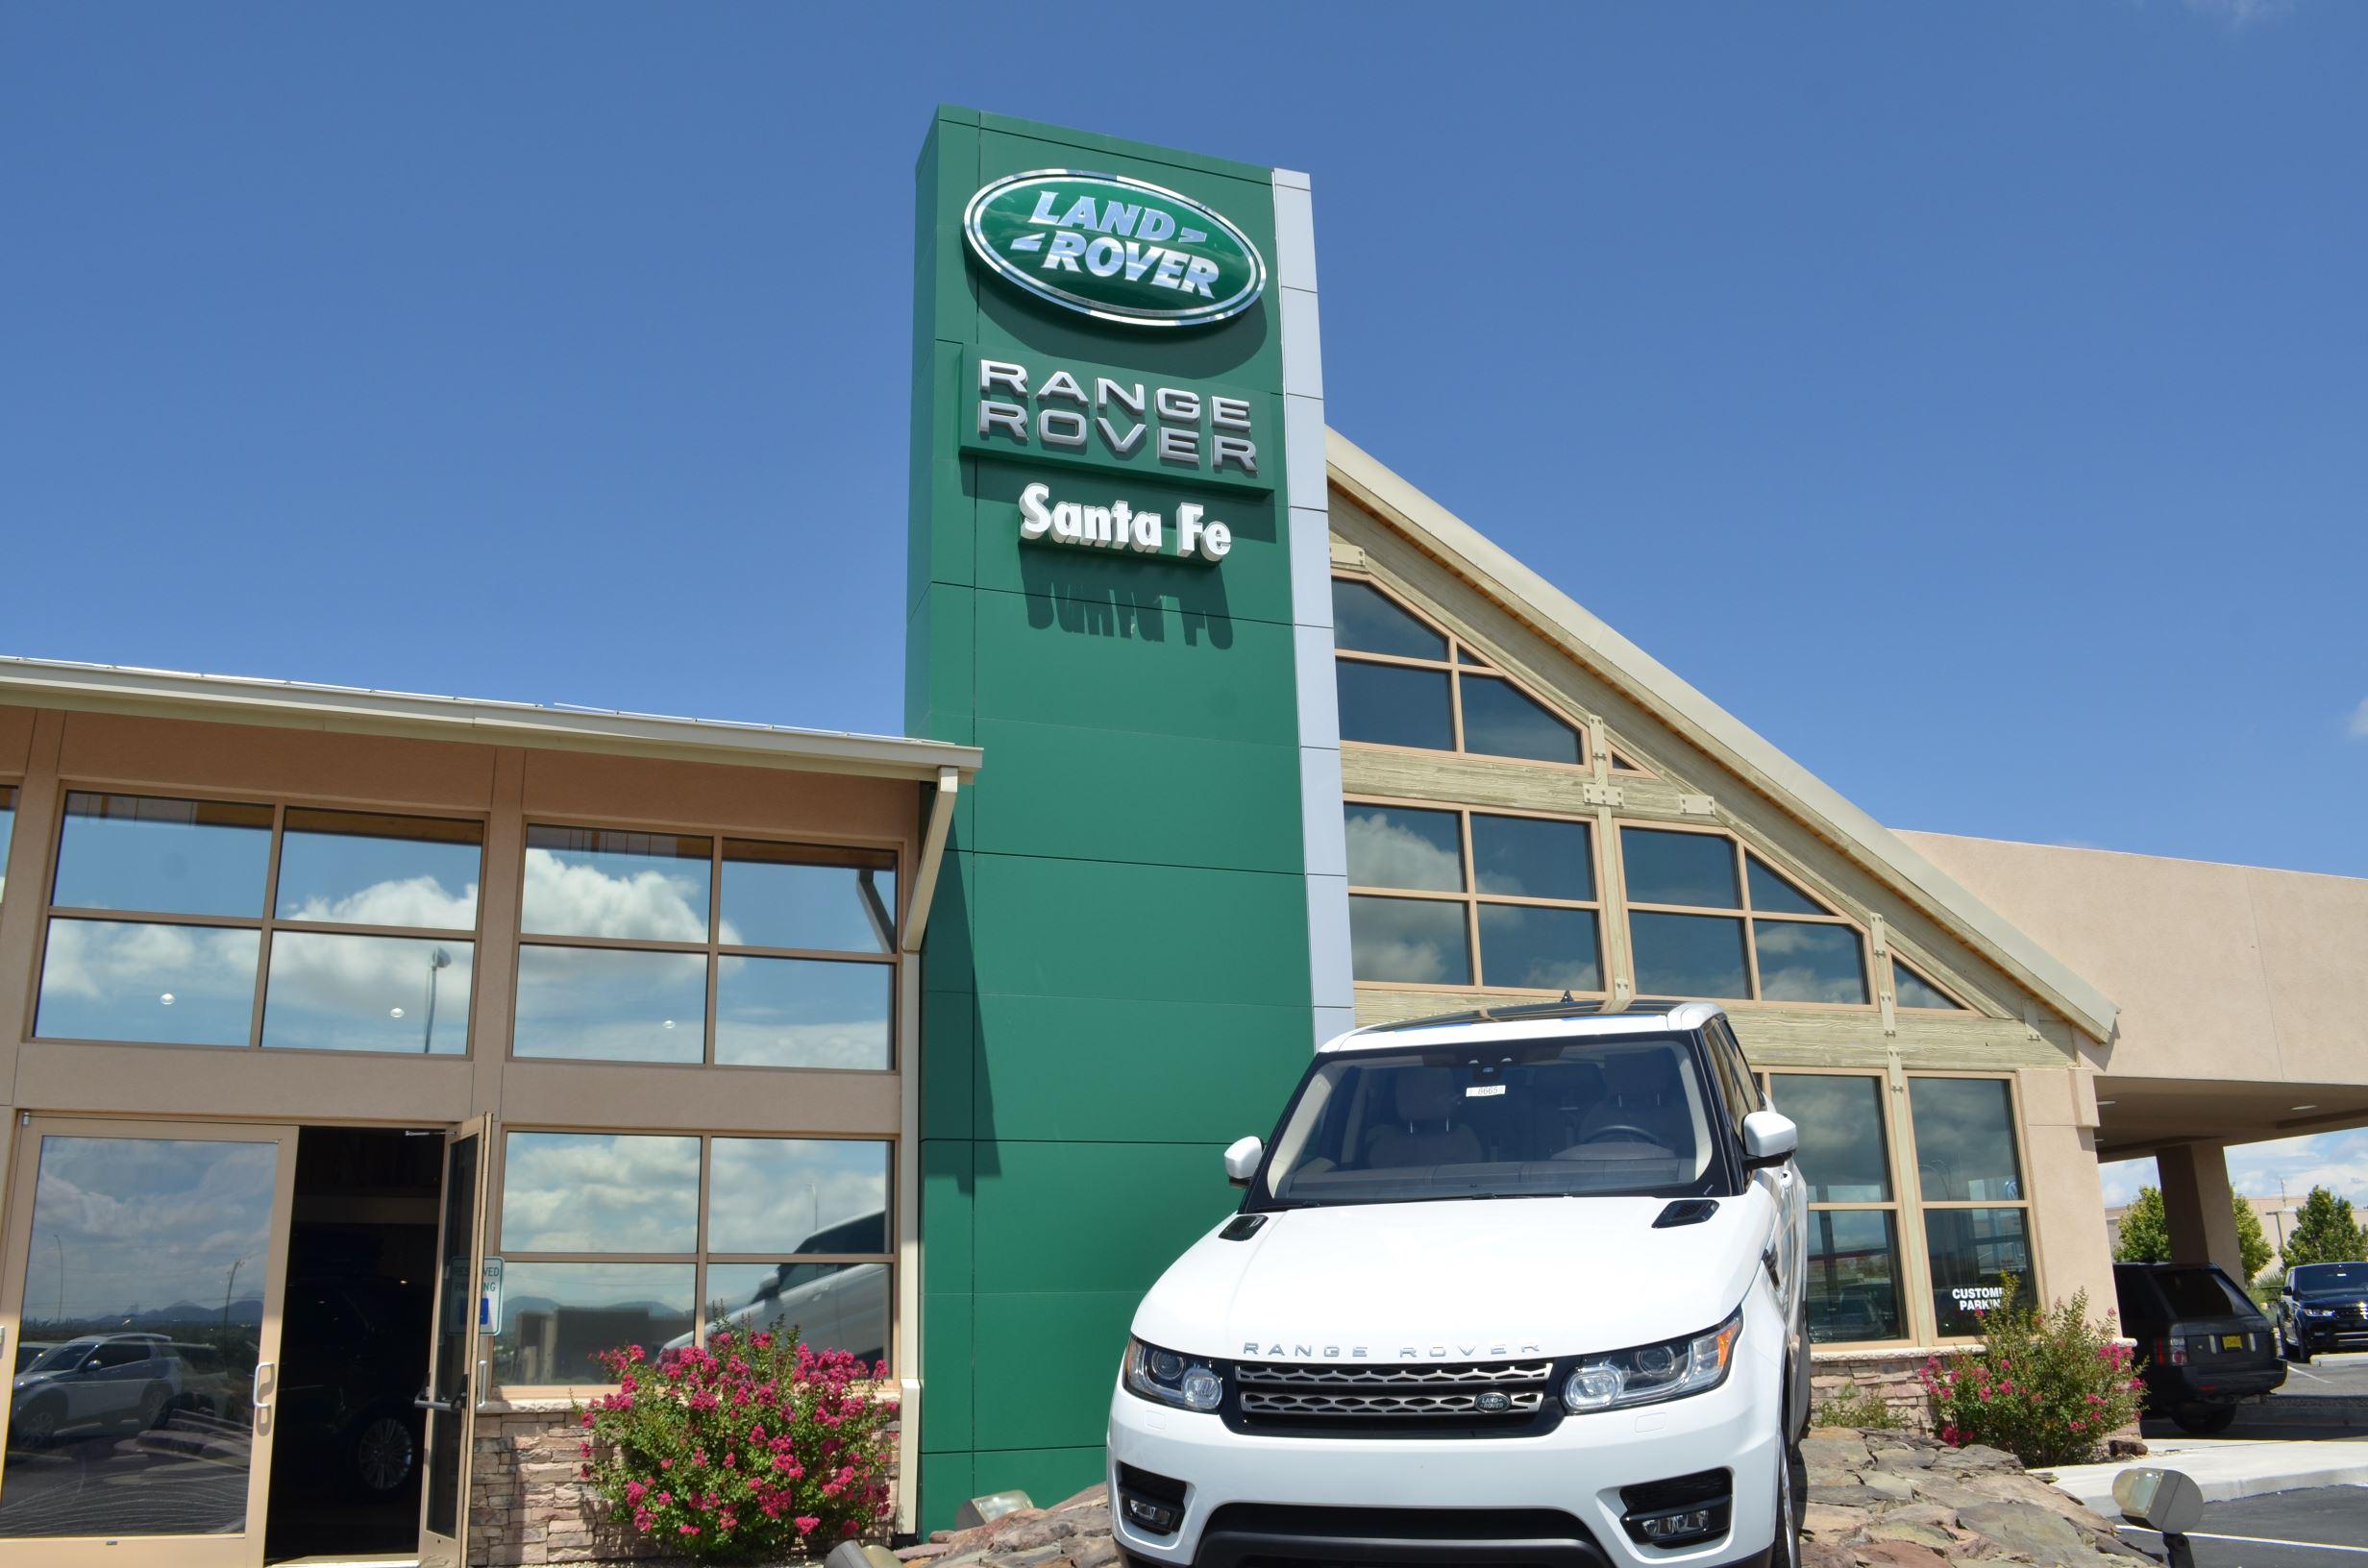 Land Rover Santa Fe image 1